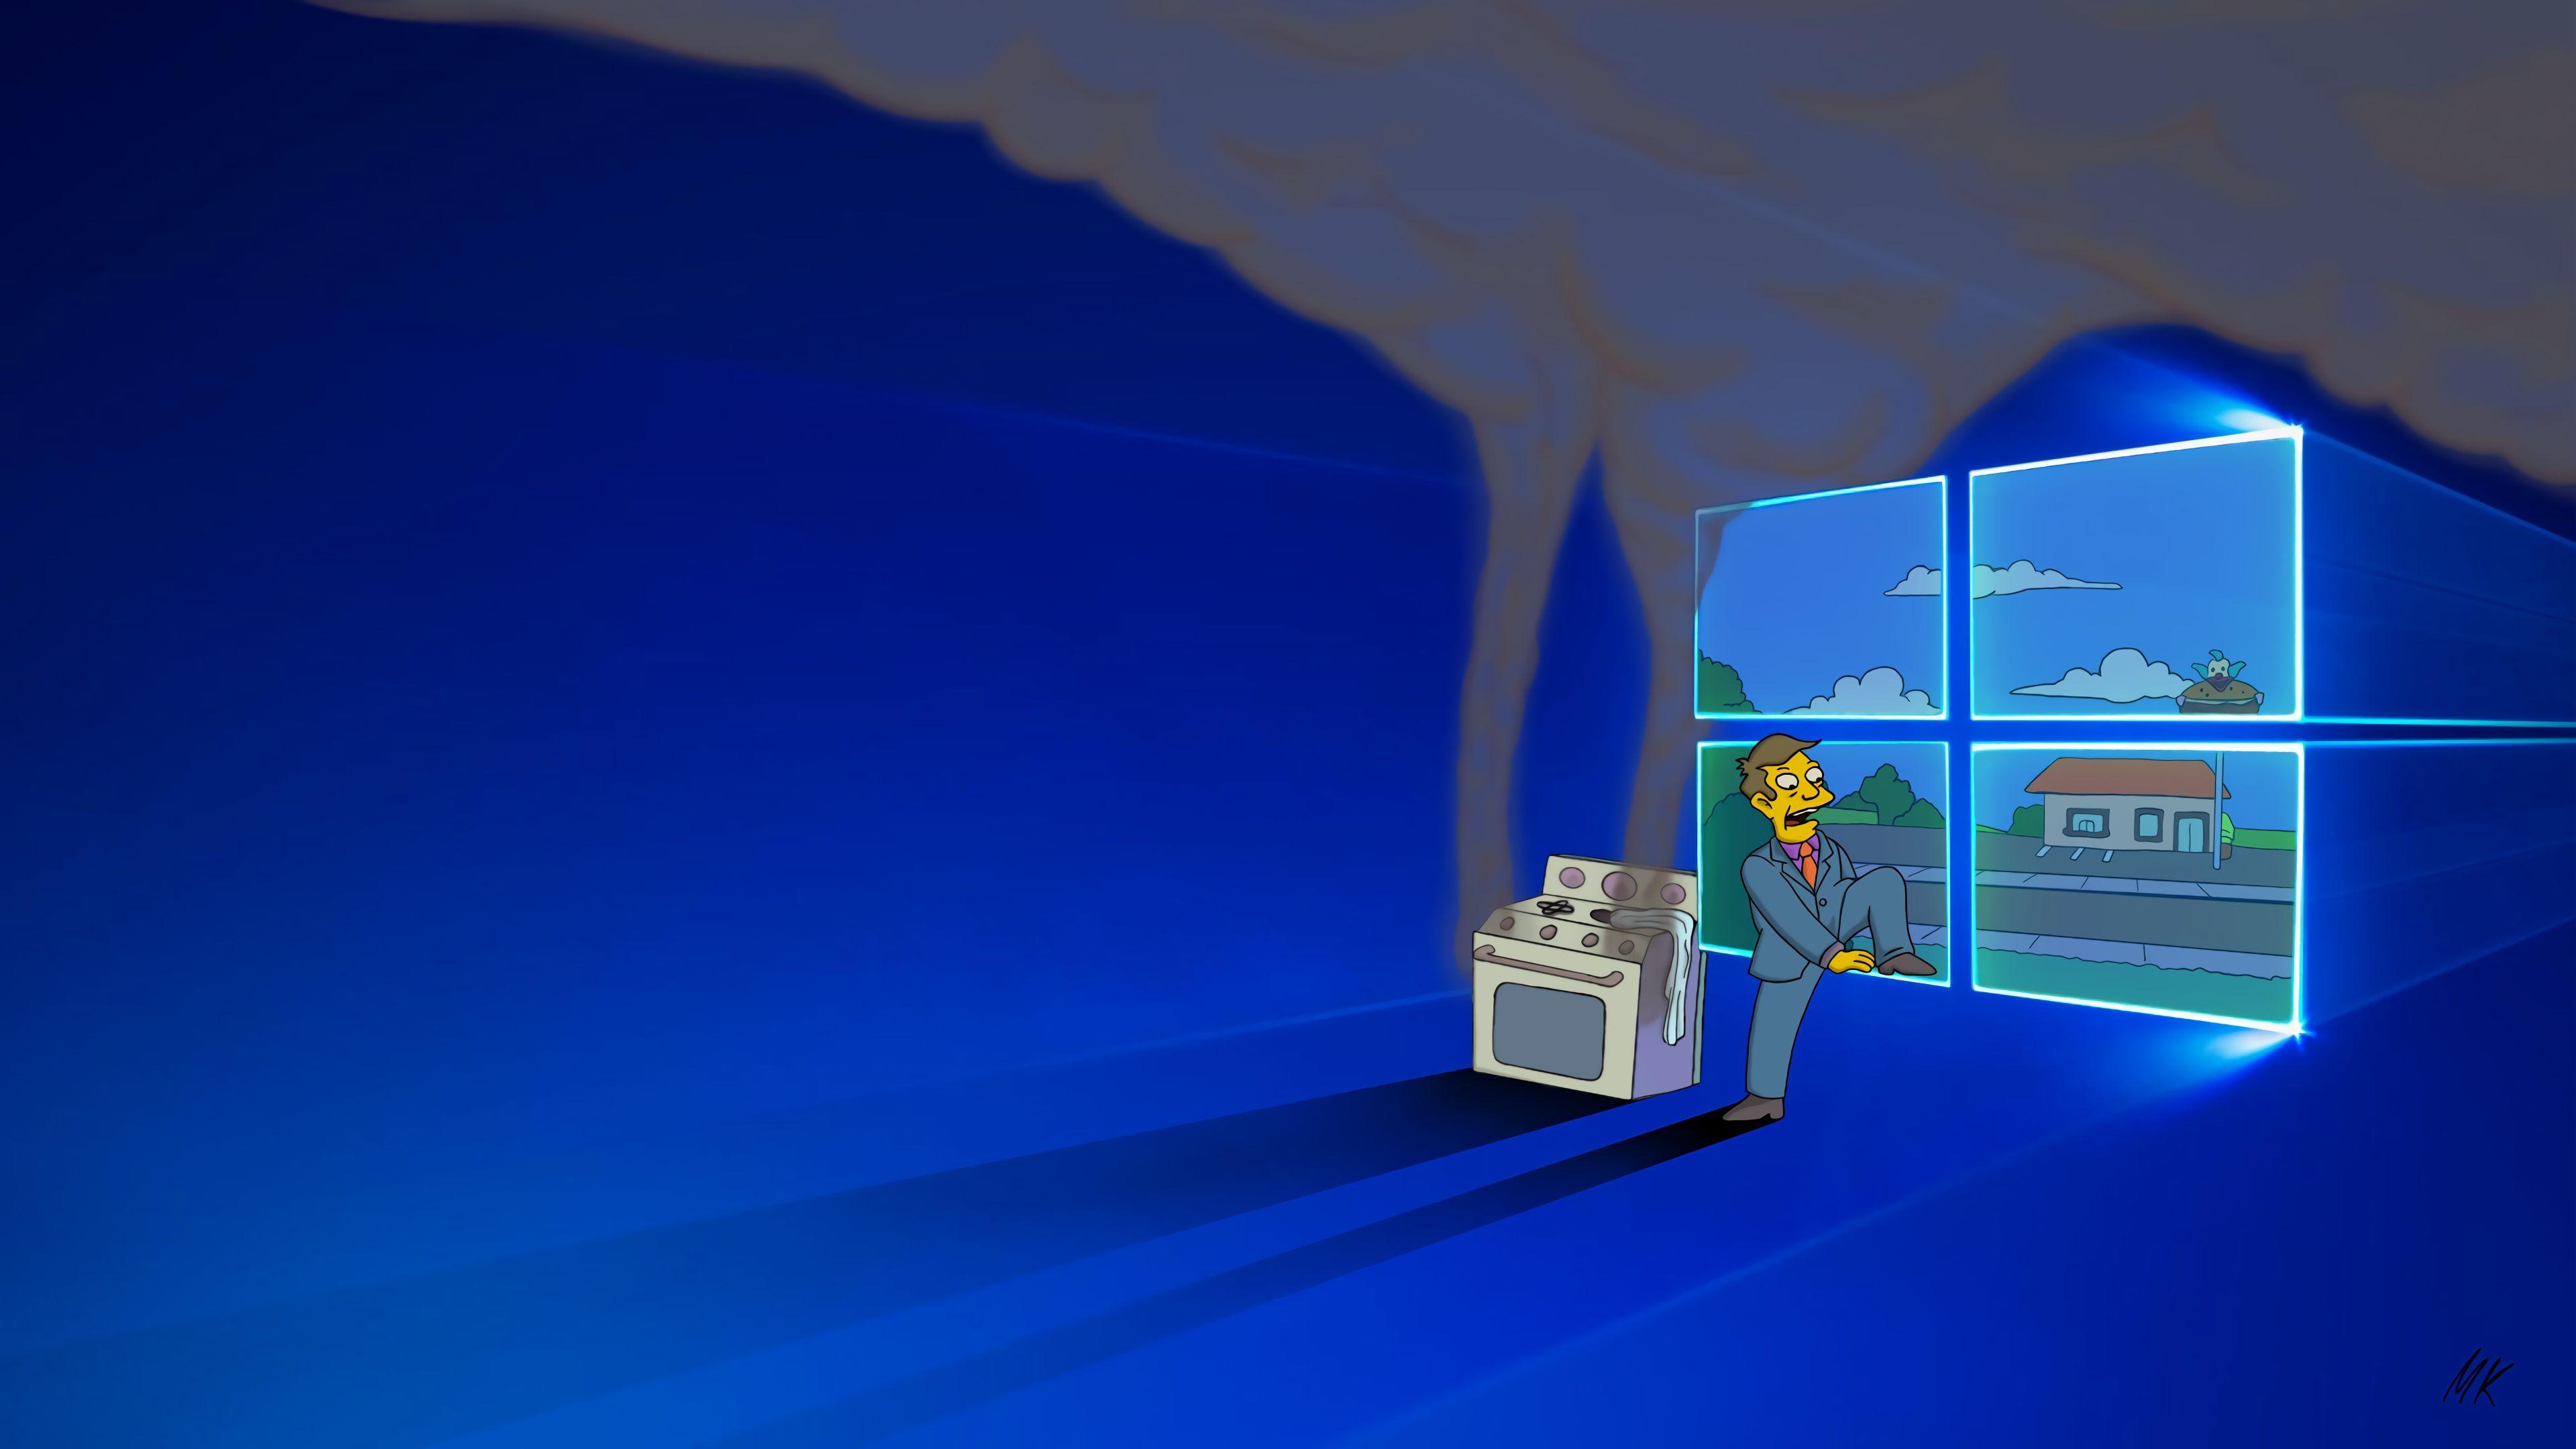 [3840x2160] Steamed Hams. Wallpaper, Windows 10, Desktop